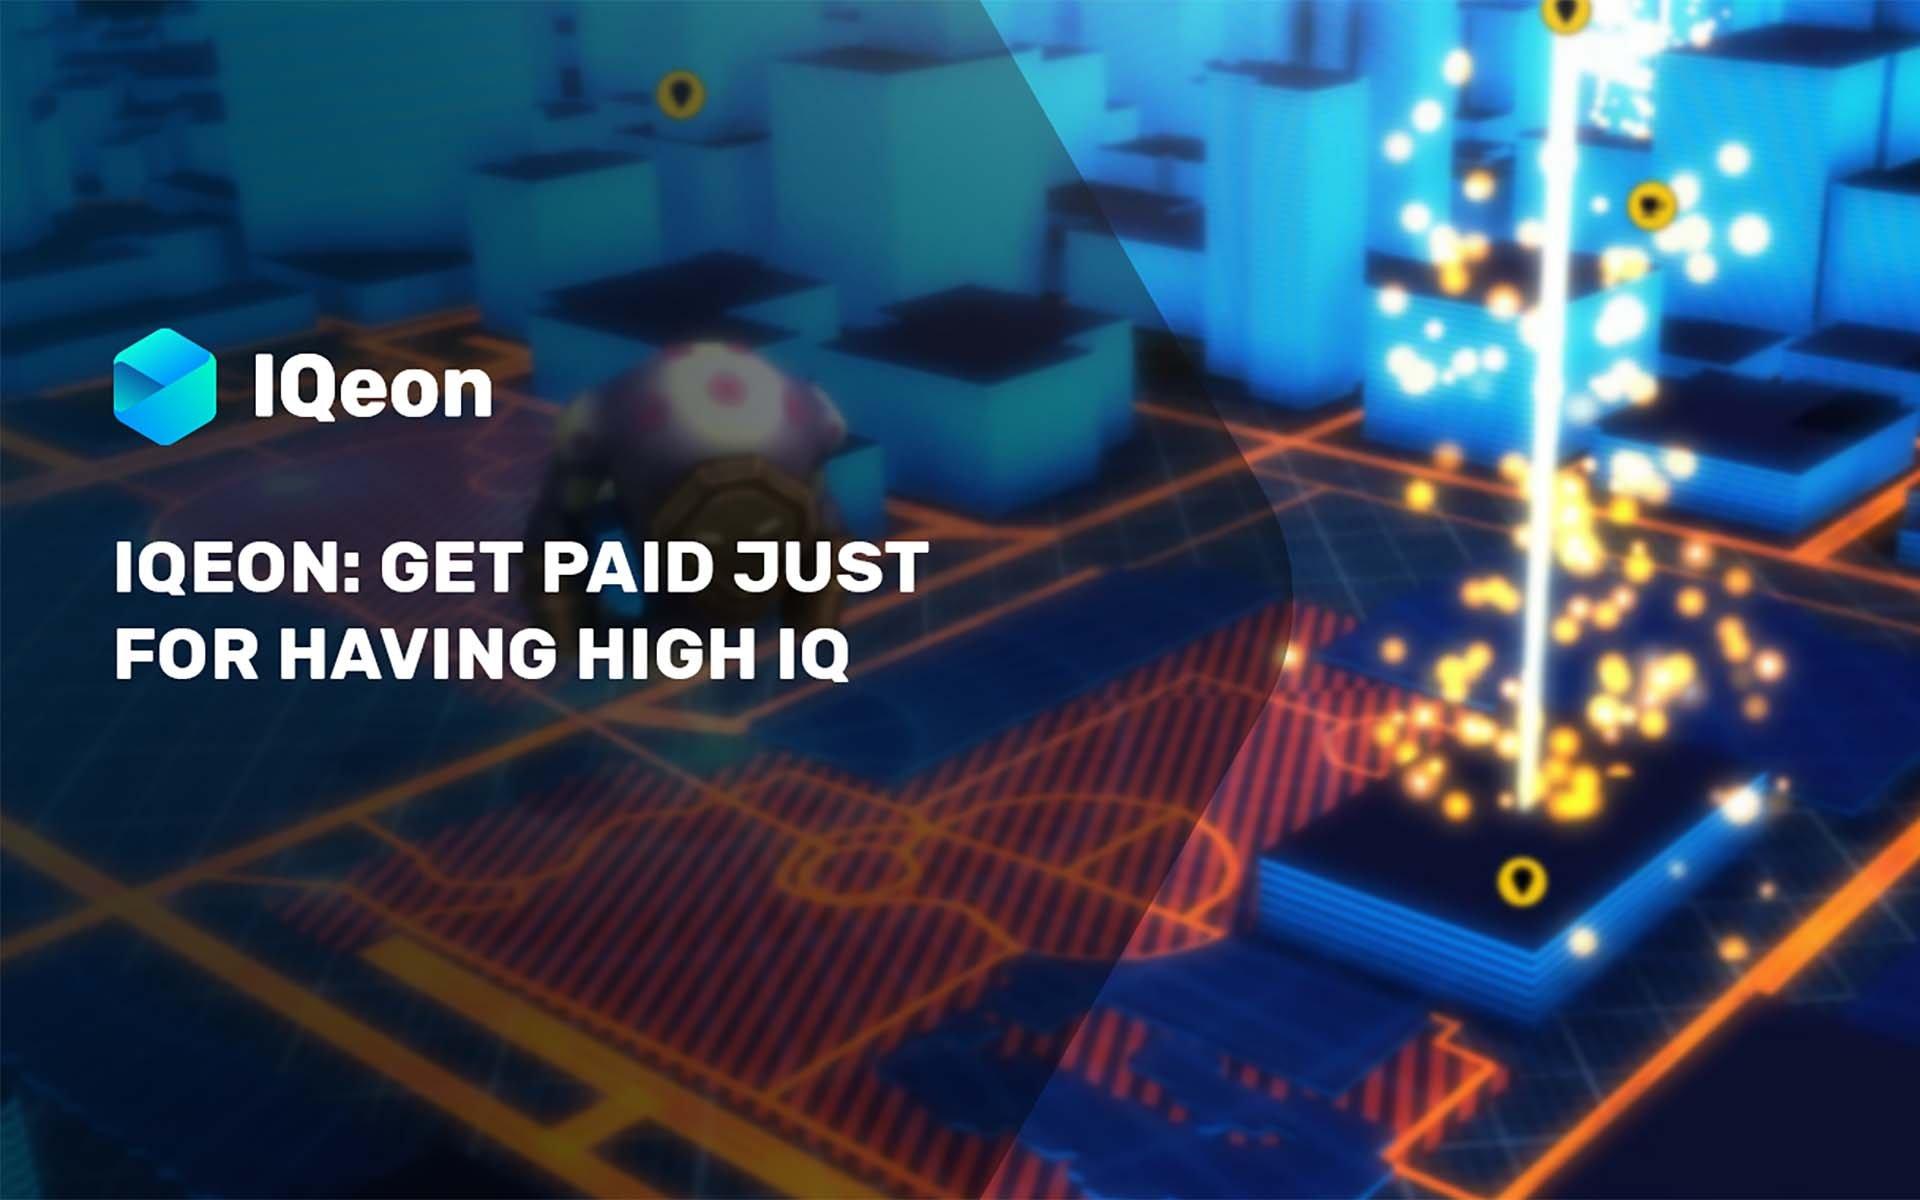 IQeon to Launch Main Round of ICO, Get 30% Bonus on January 30